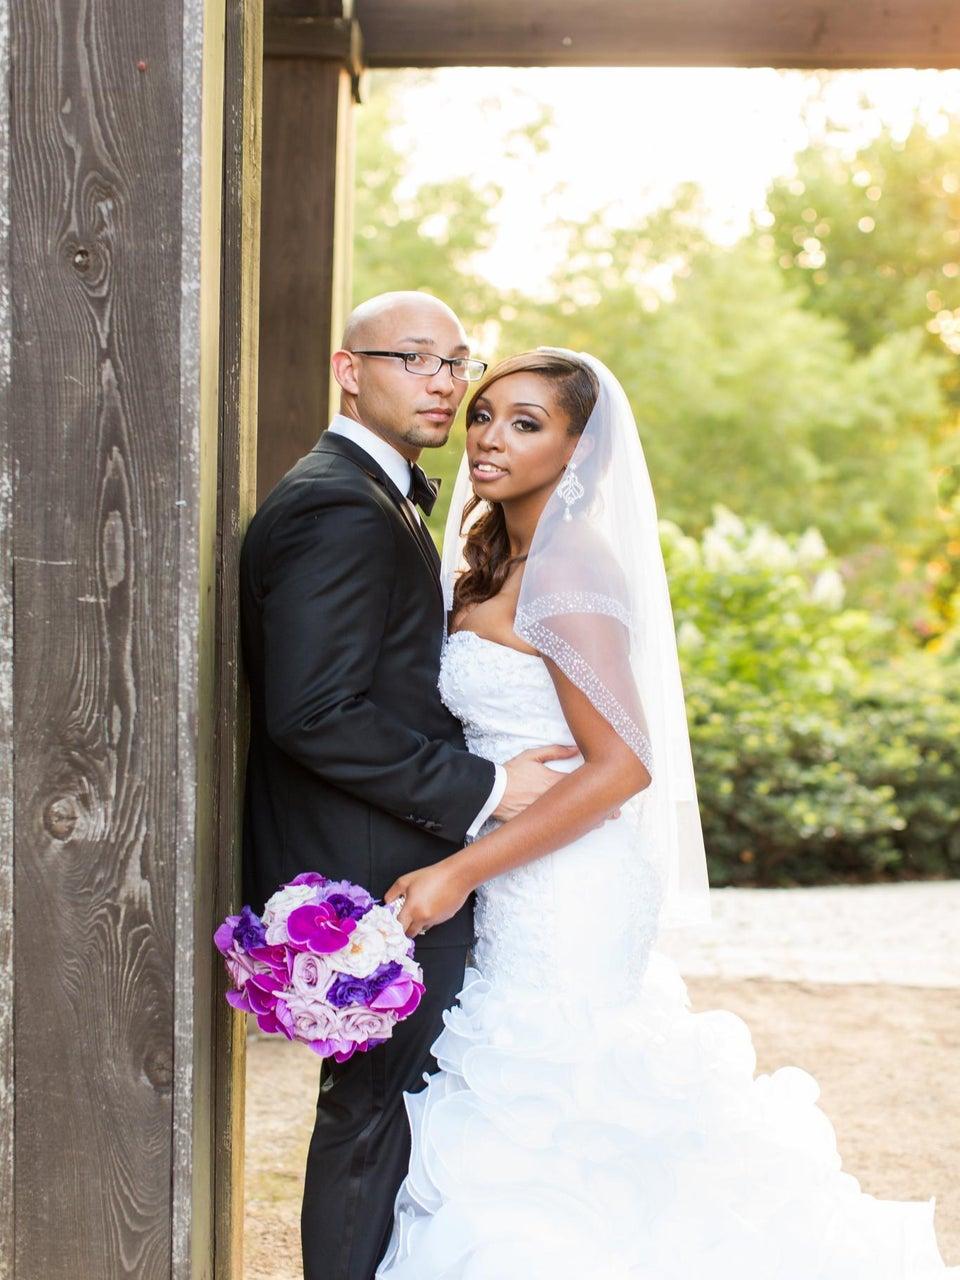 Bridal Bliss: Daedrea and Chris' Atlanta Wedding